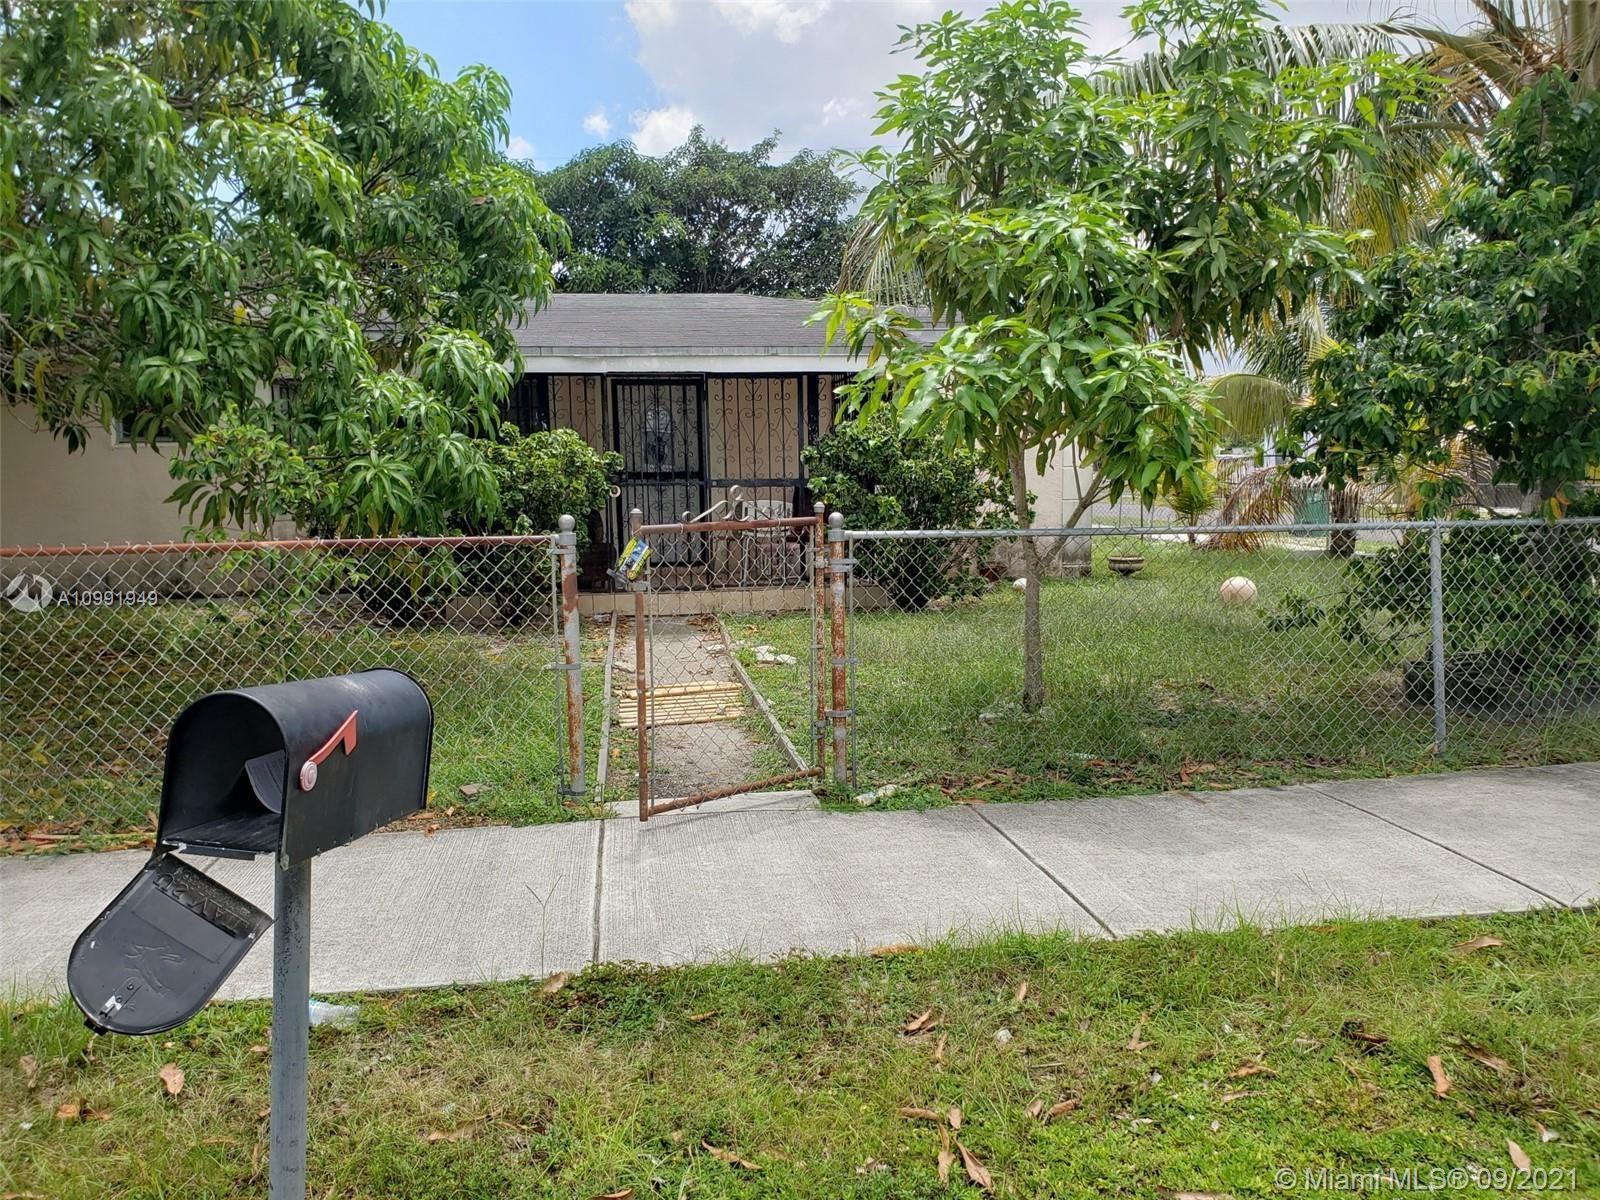 2830 NW 156th St, Miami Gardens, FL 33054 - #: A10991949